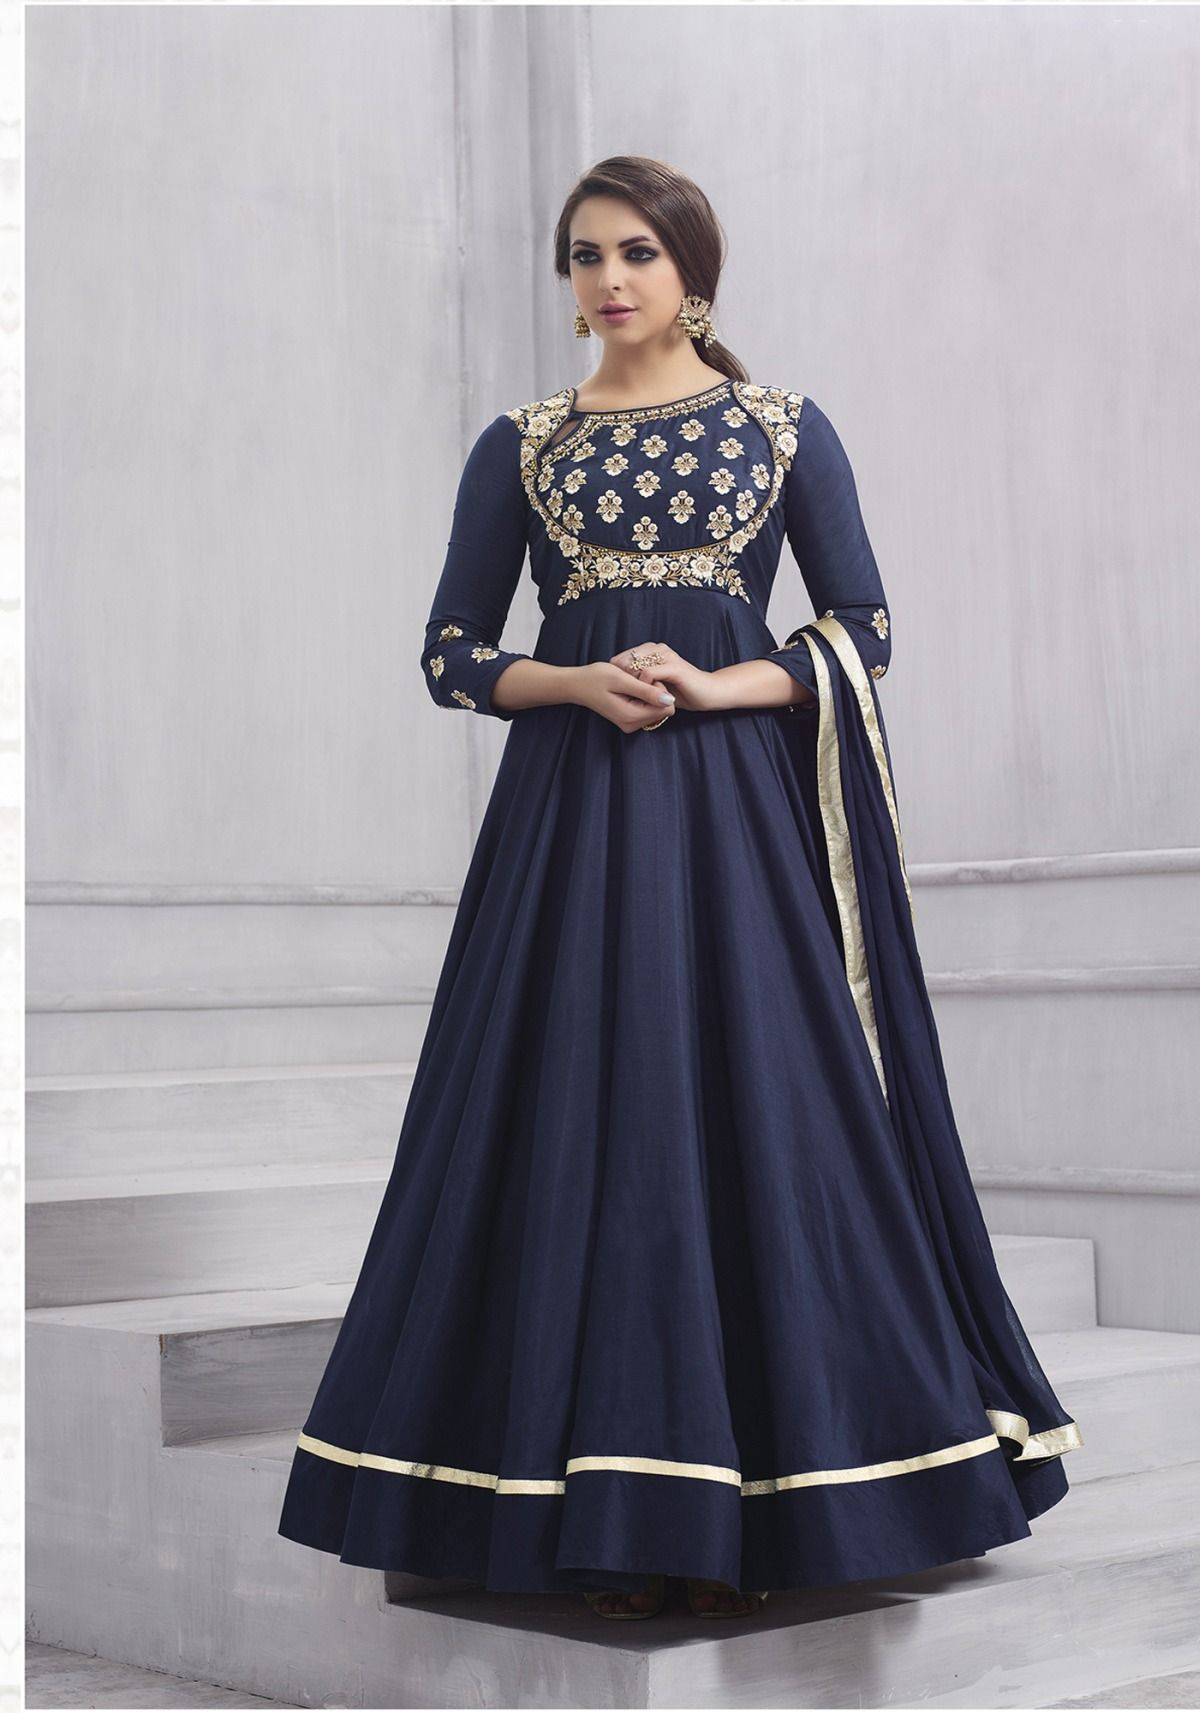 faebbf3d8e NAVY BLUE ART SILK ANARKALI SUIT SKU:418168 Product code: 418168 Color: Navy  Blue Fabric: Art Silk Work: Stone, Thread, Zari Embroidery